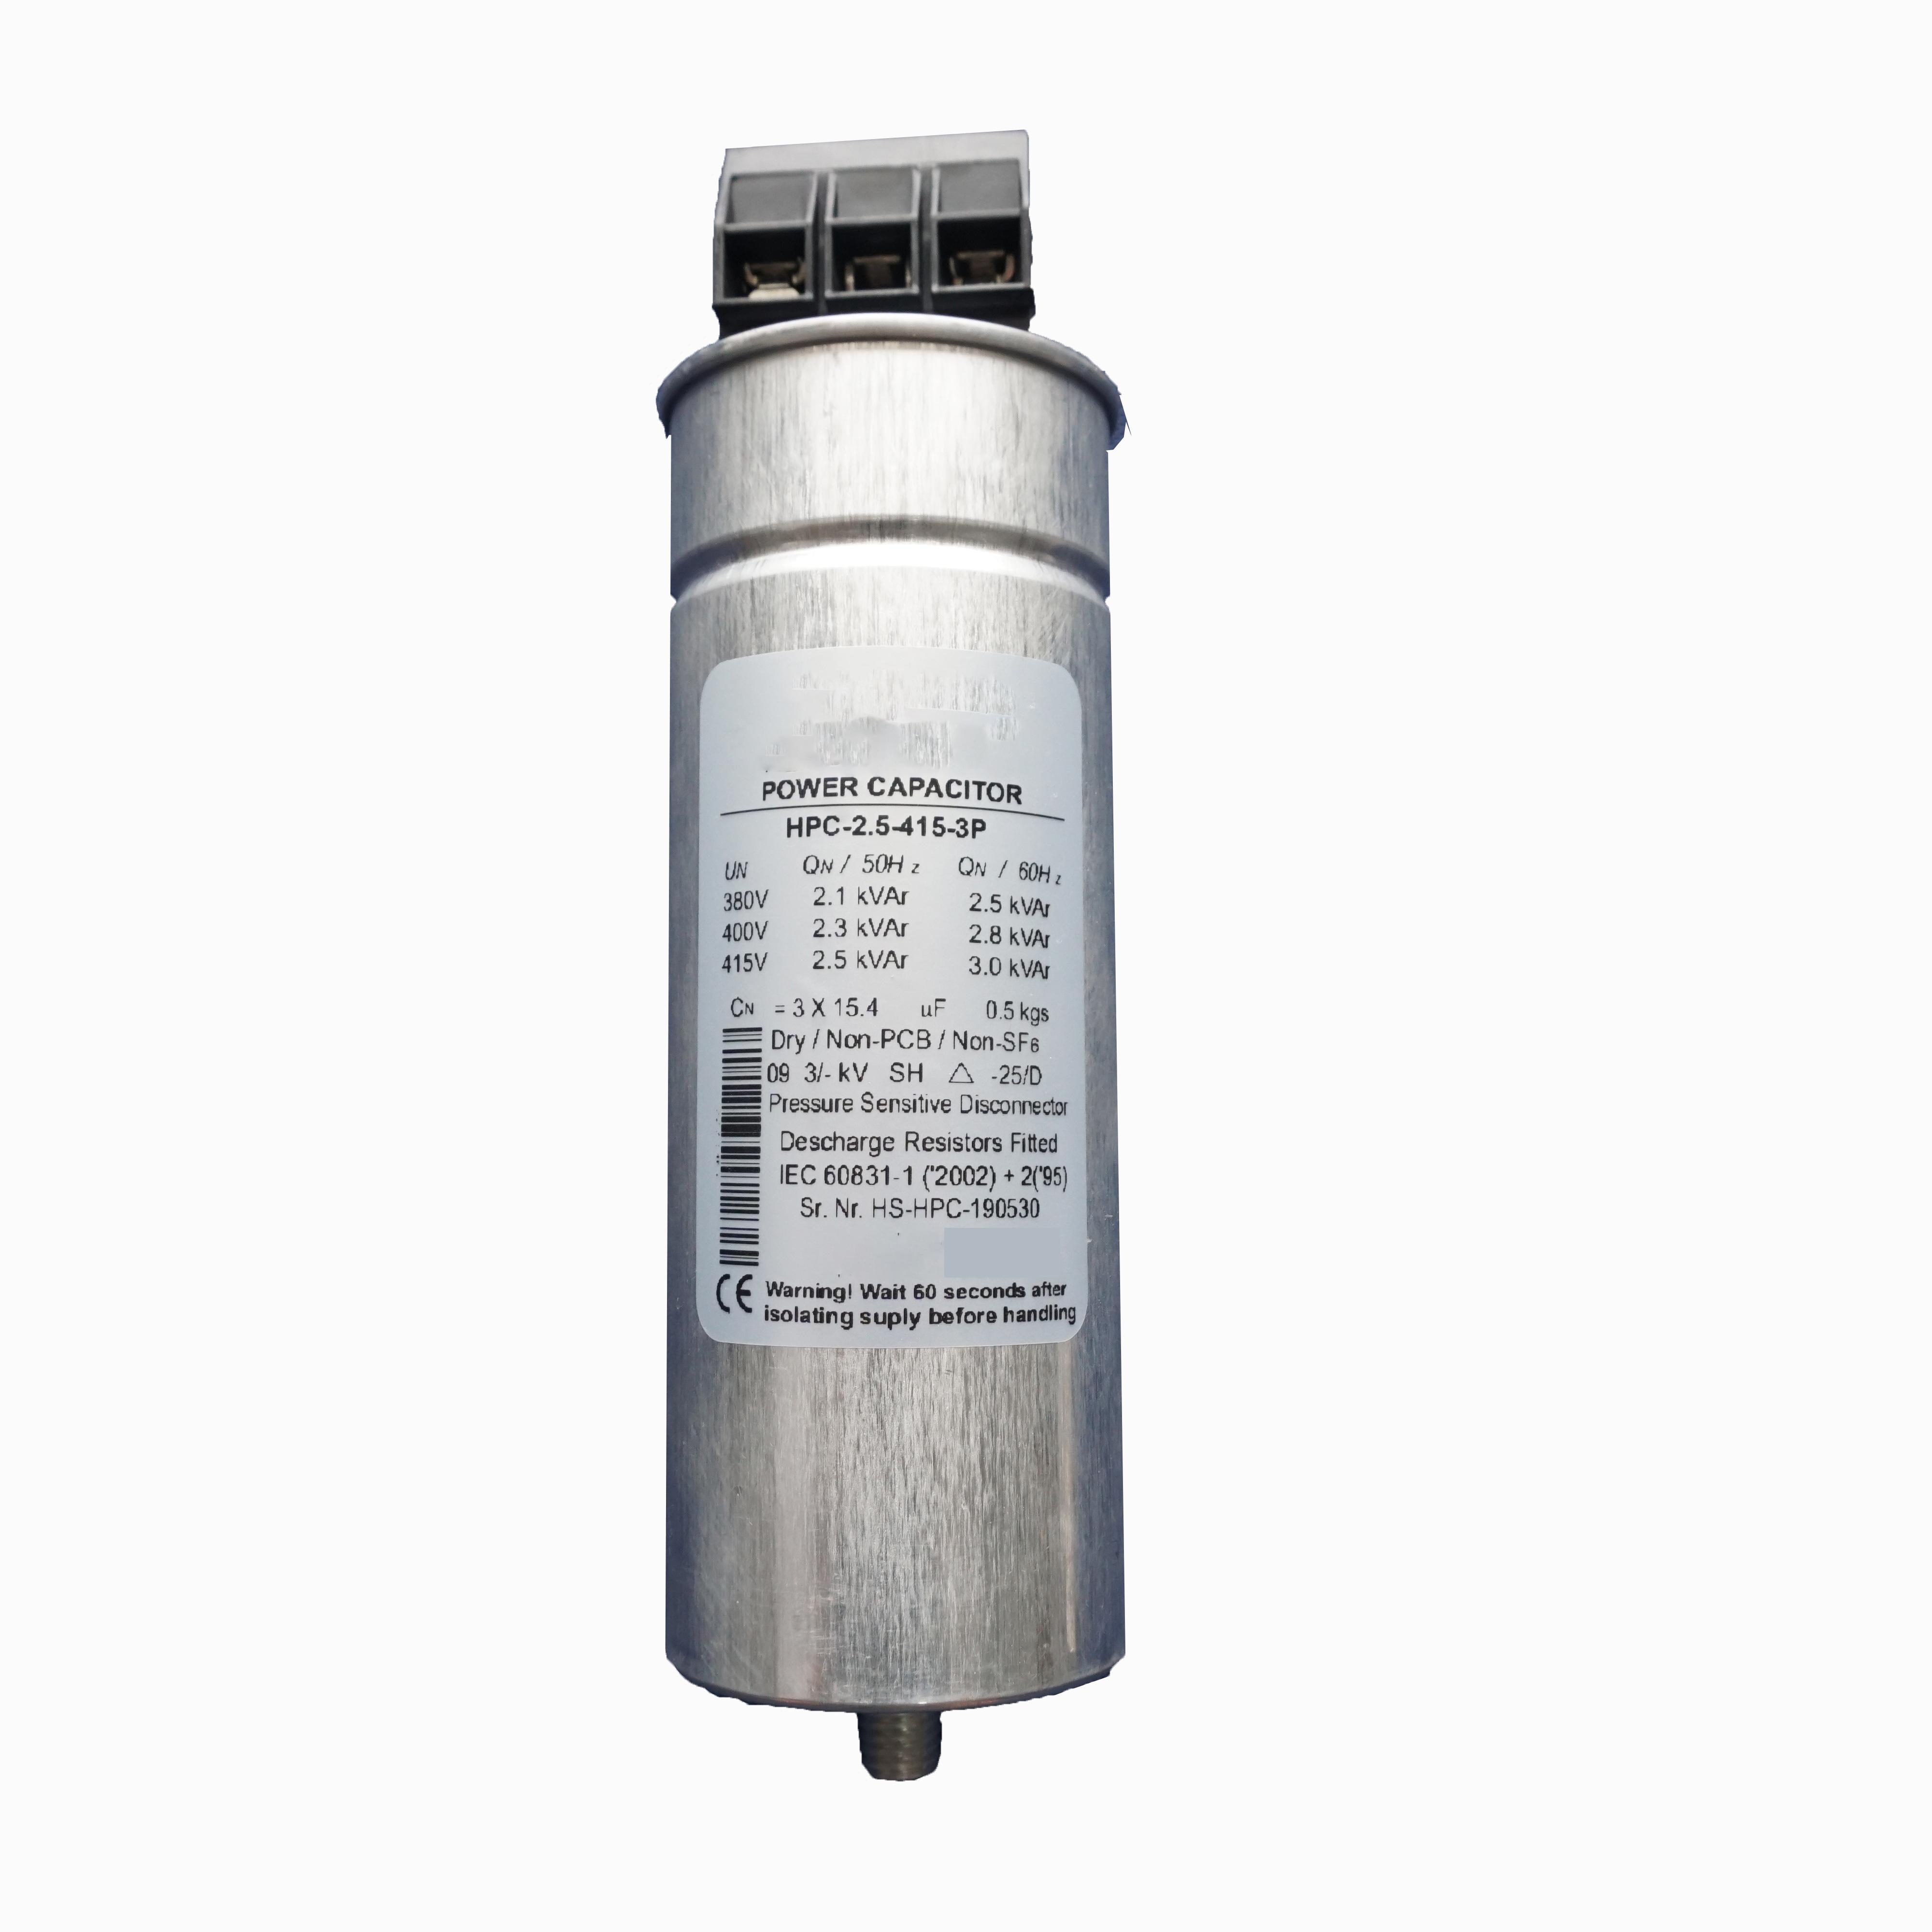 Bkmj 20 Kvar Series Reactive Power Compensation Capacitor Buy Power Compensation Capacitor Product On Alibaba Com